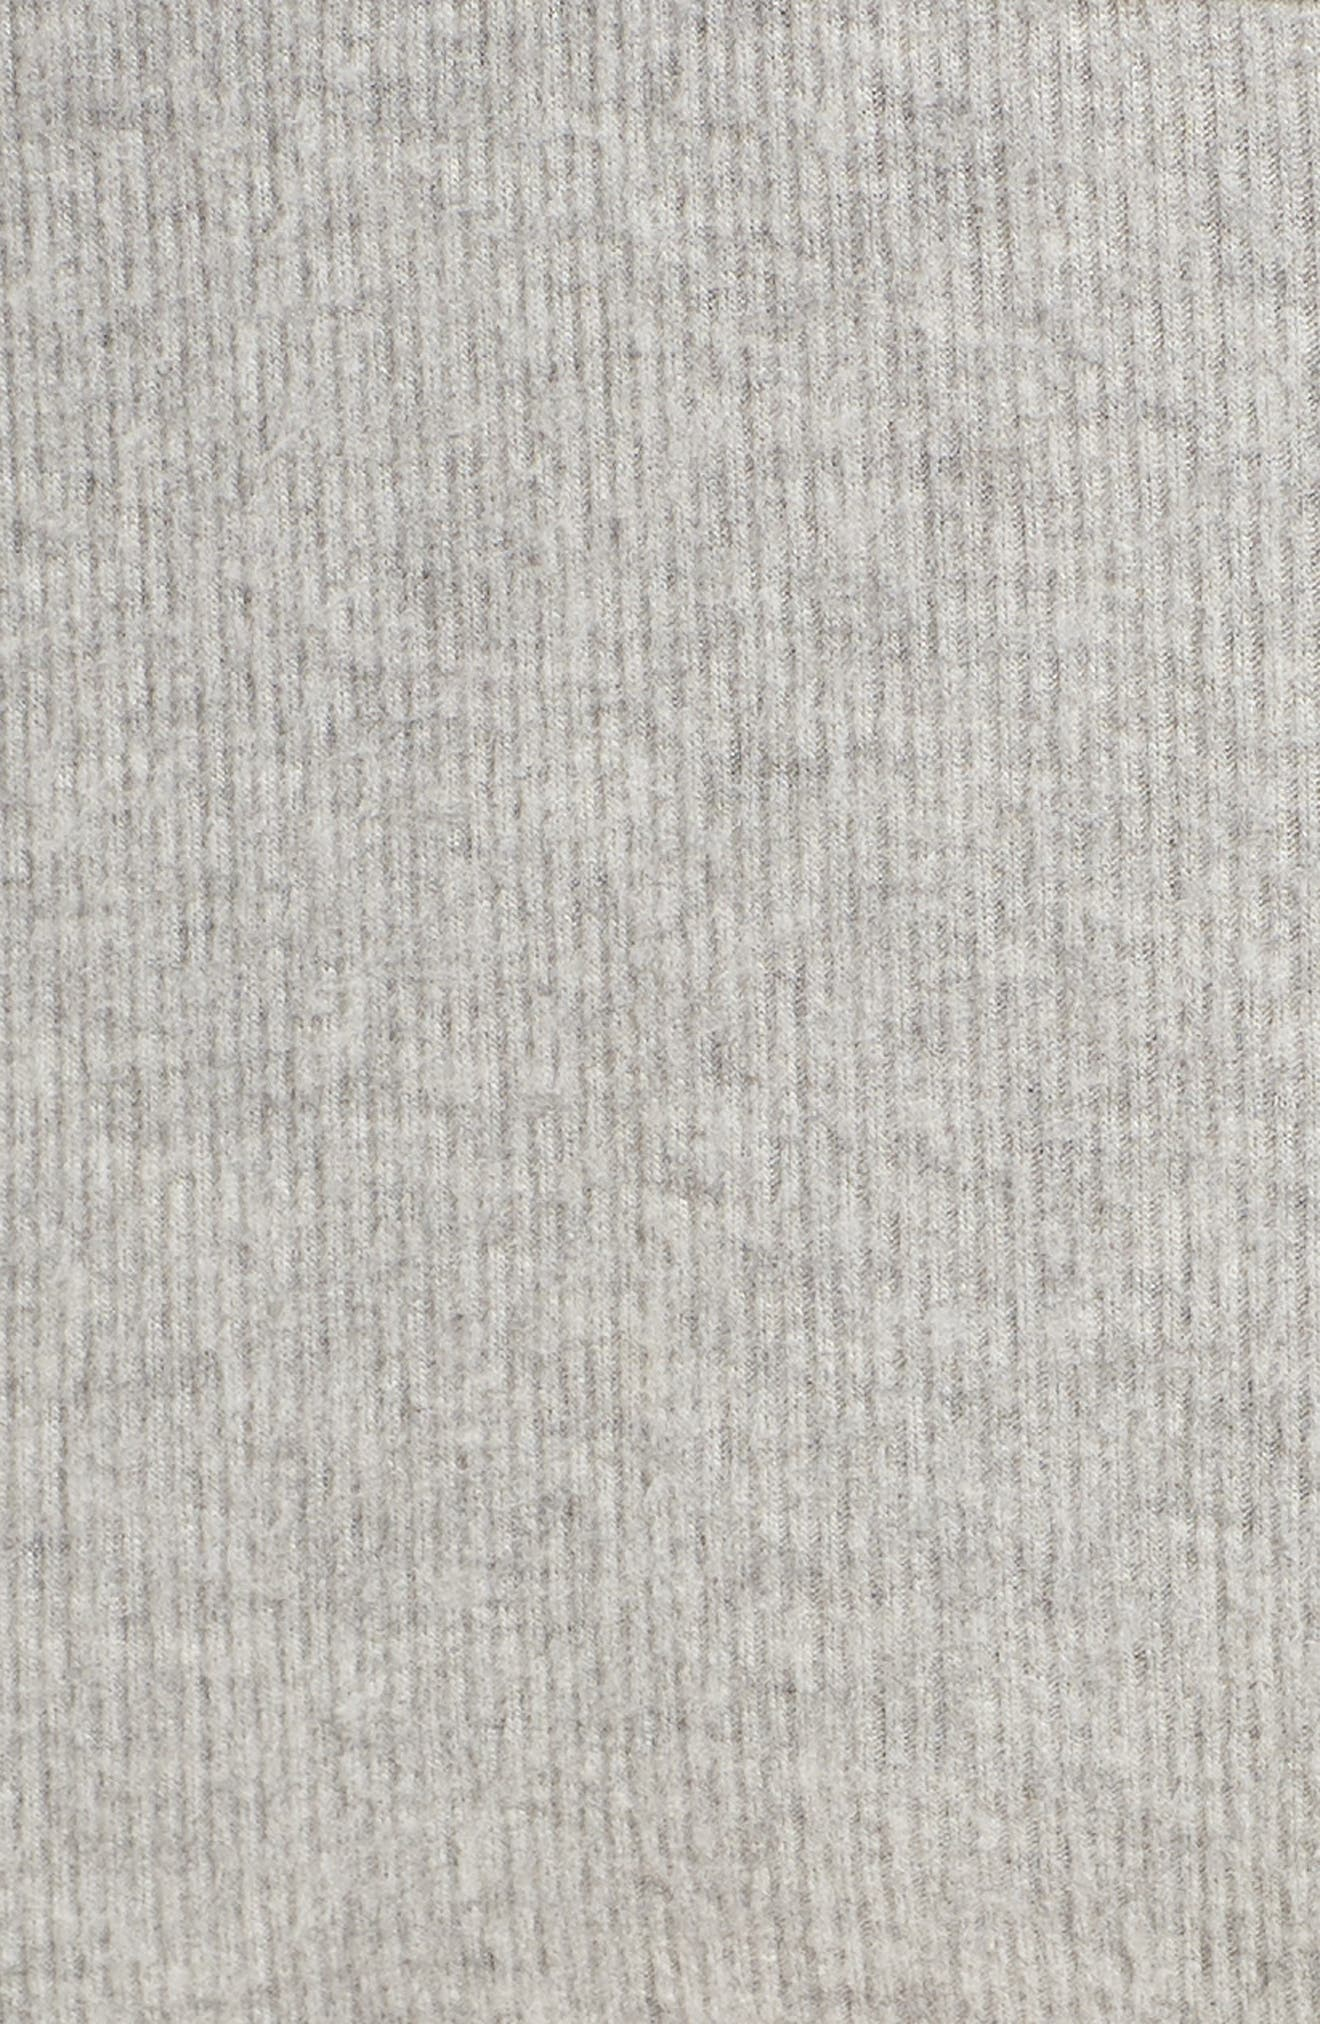 Peony Shorts,                             Alternate thumbnail 5, color,                             021